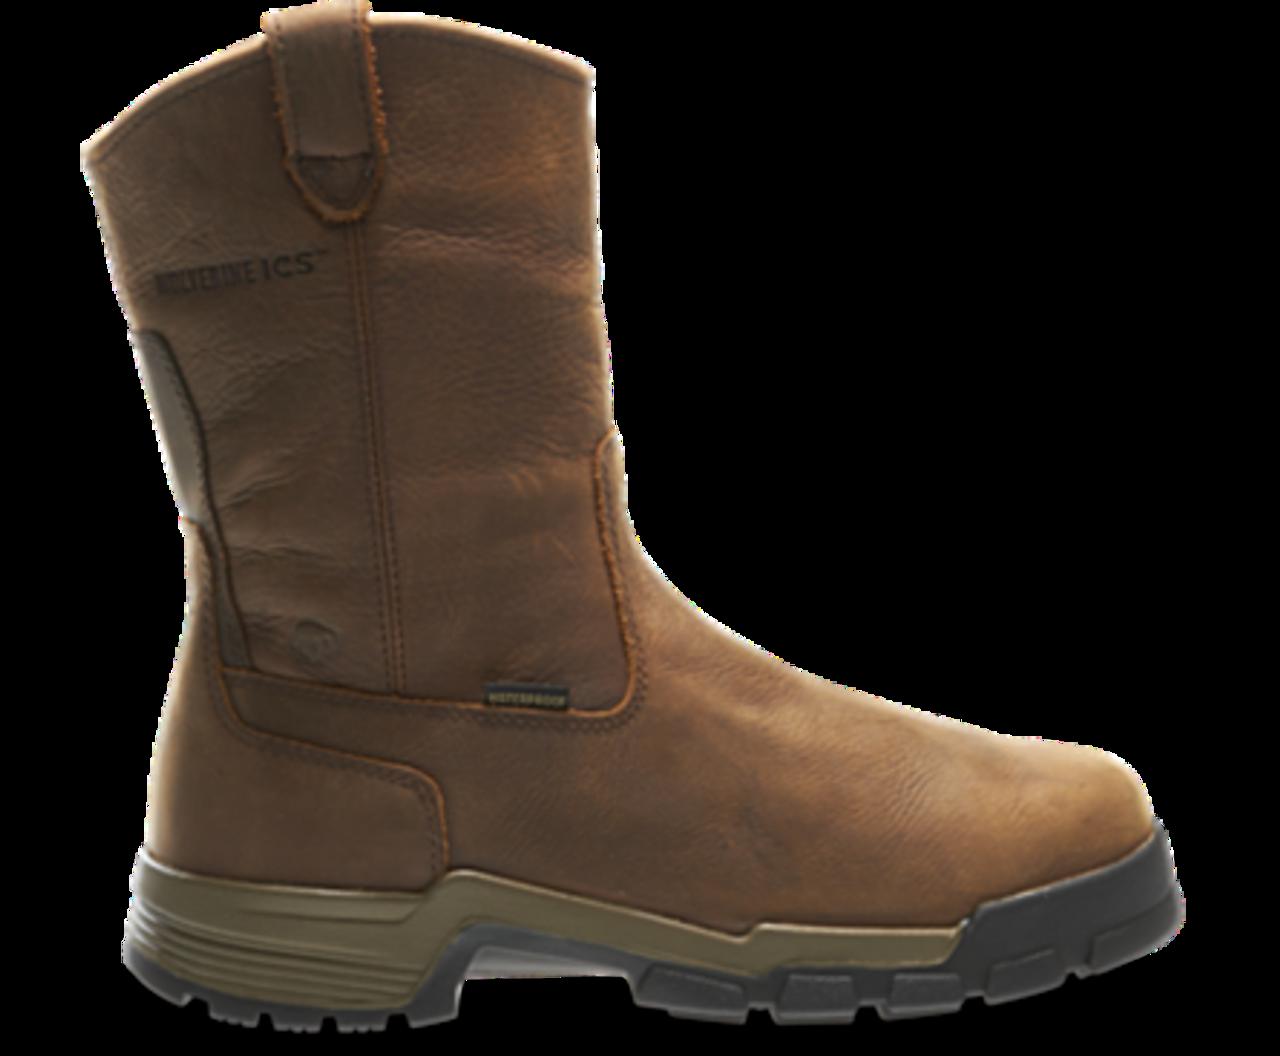 Wolverine ICS Waterproof 6 Boot Composite Toe D1L7IM17